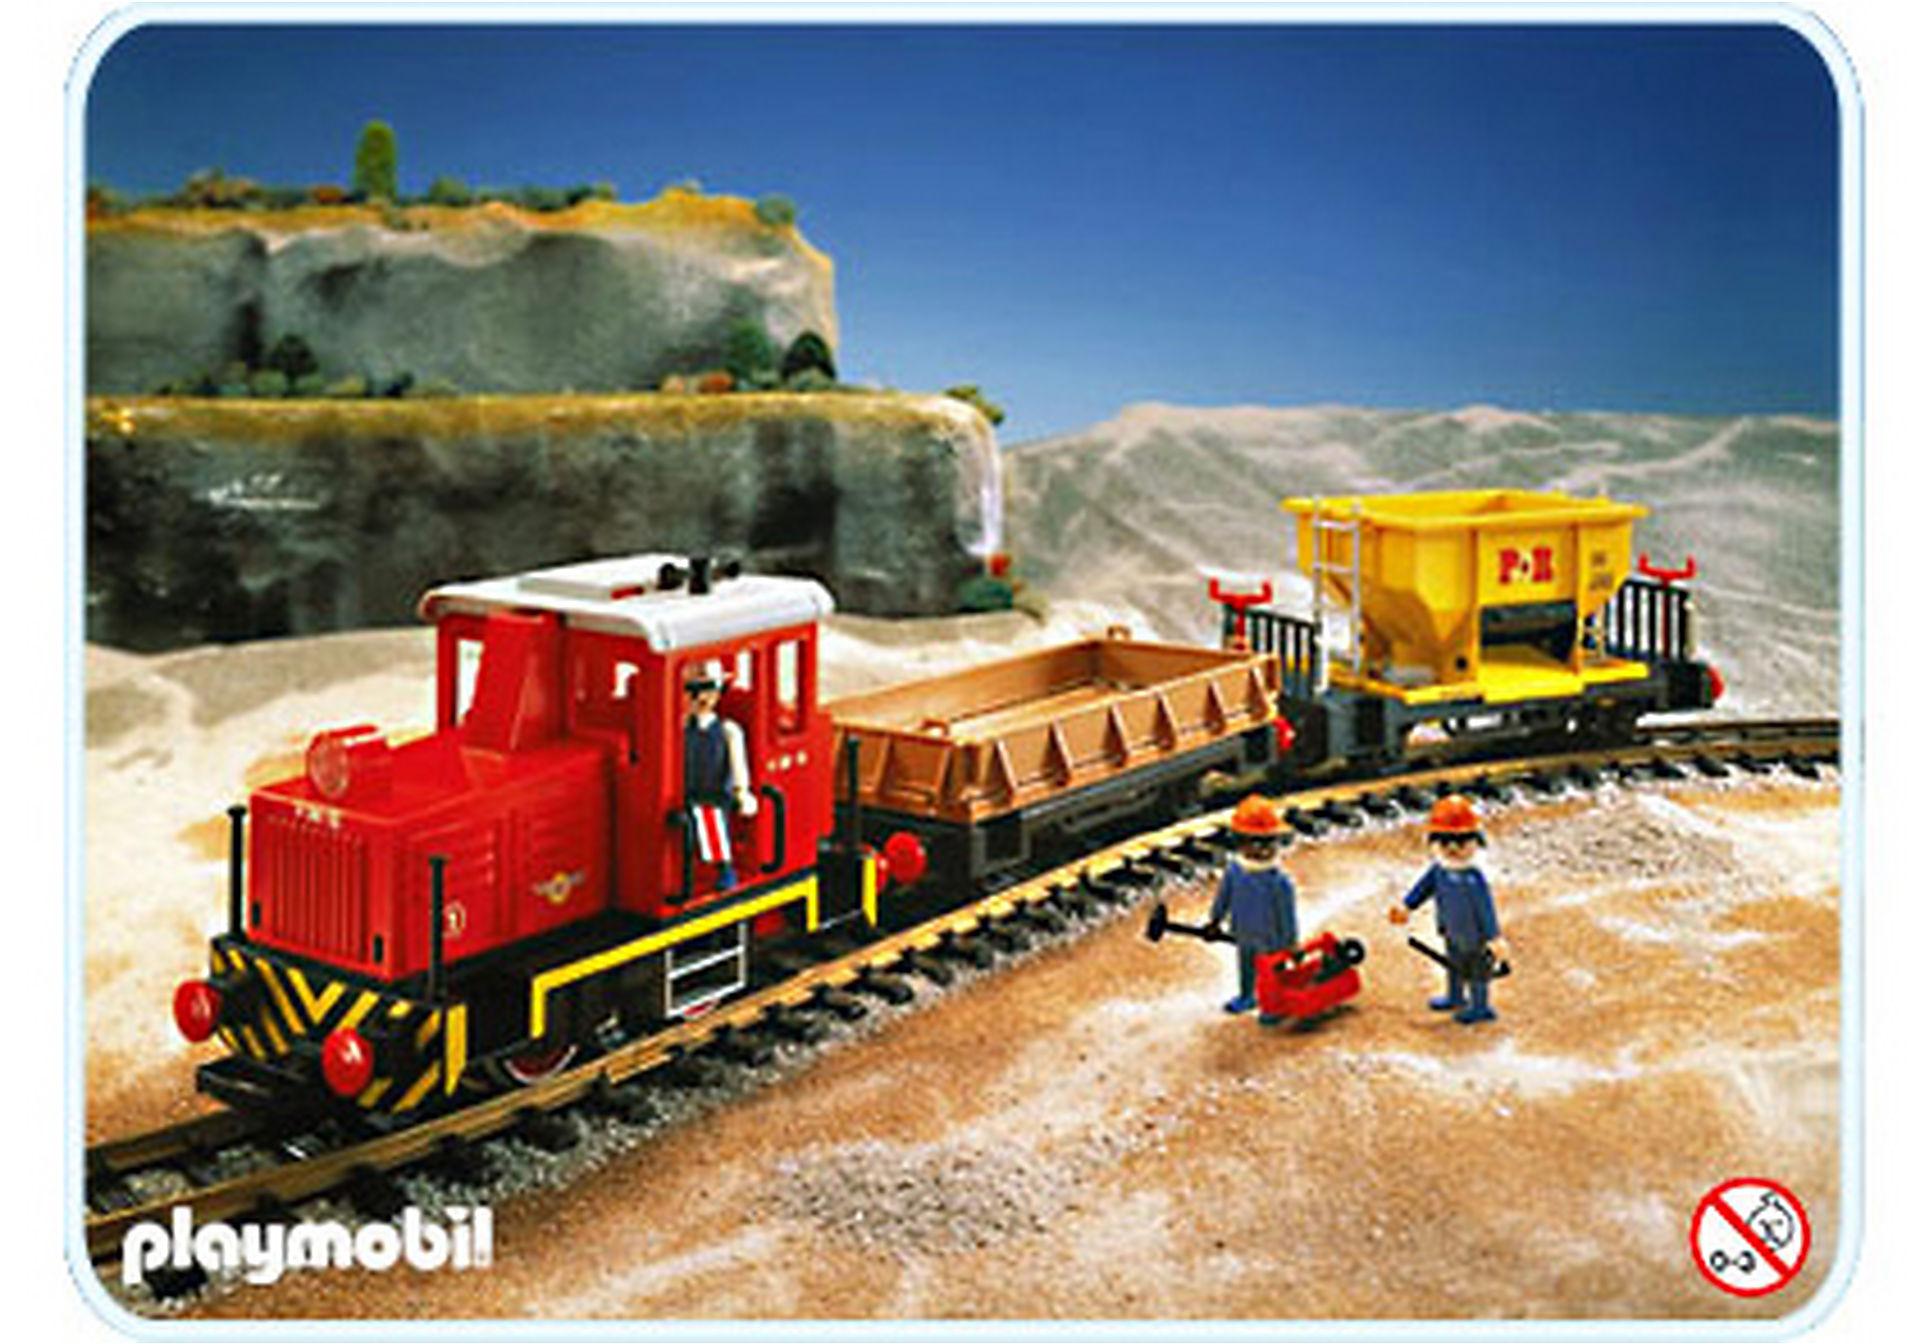 4027-A Güterzug-Set mit Diesellok zoom image1